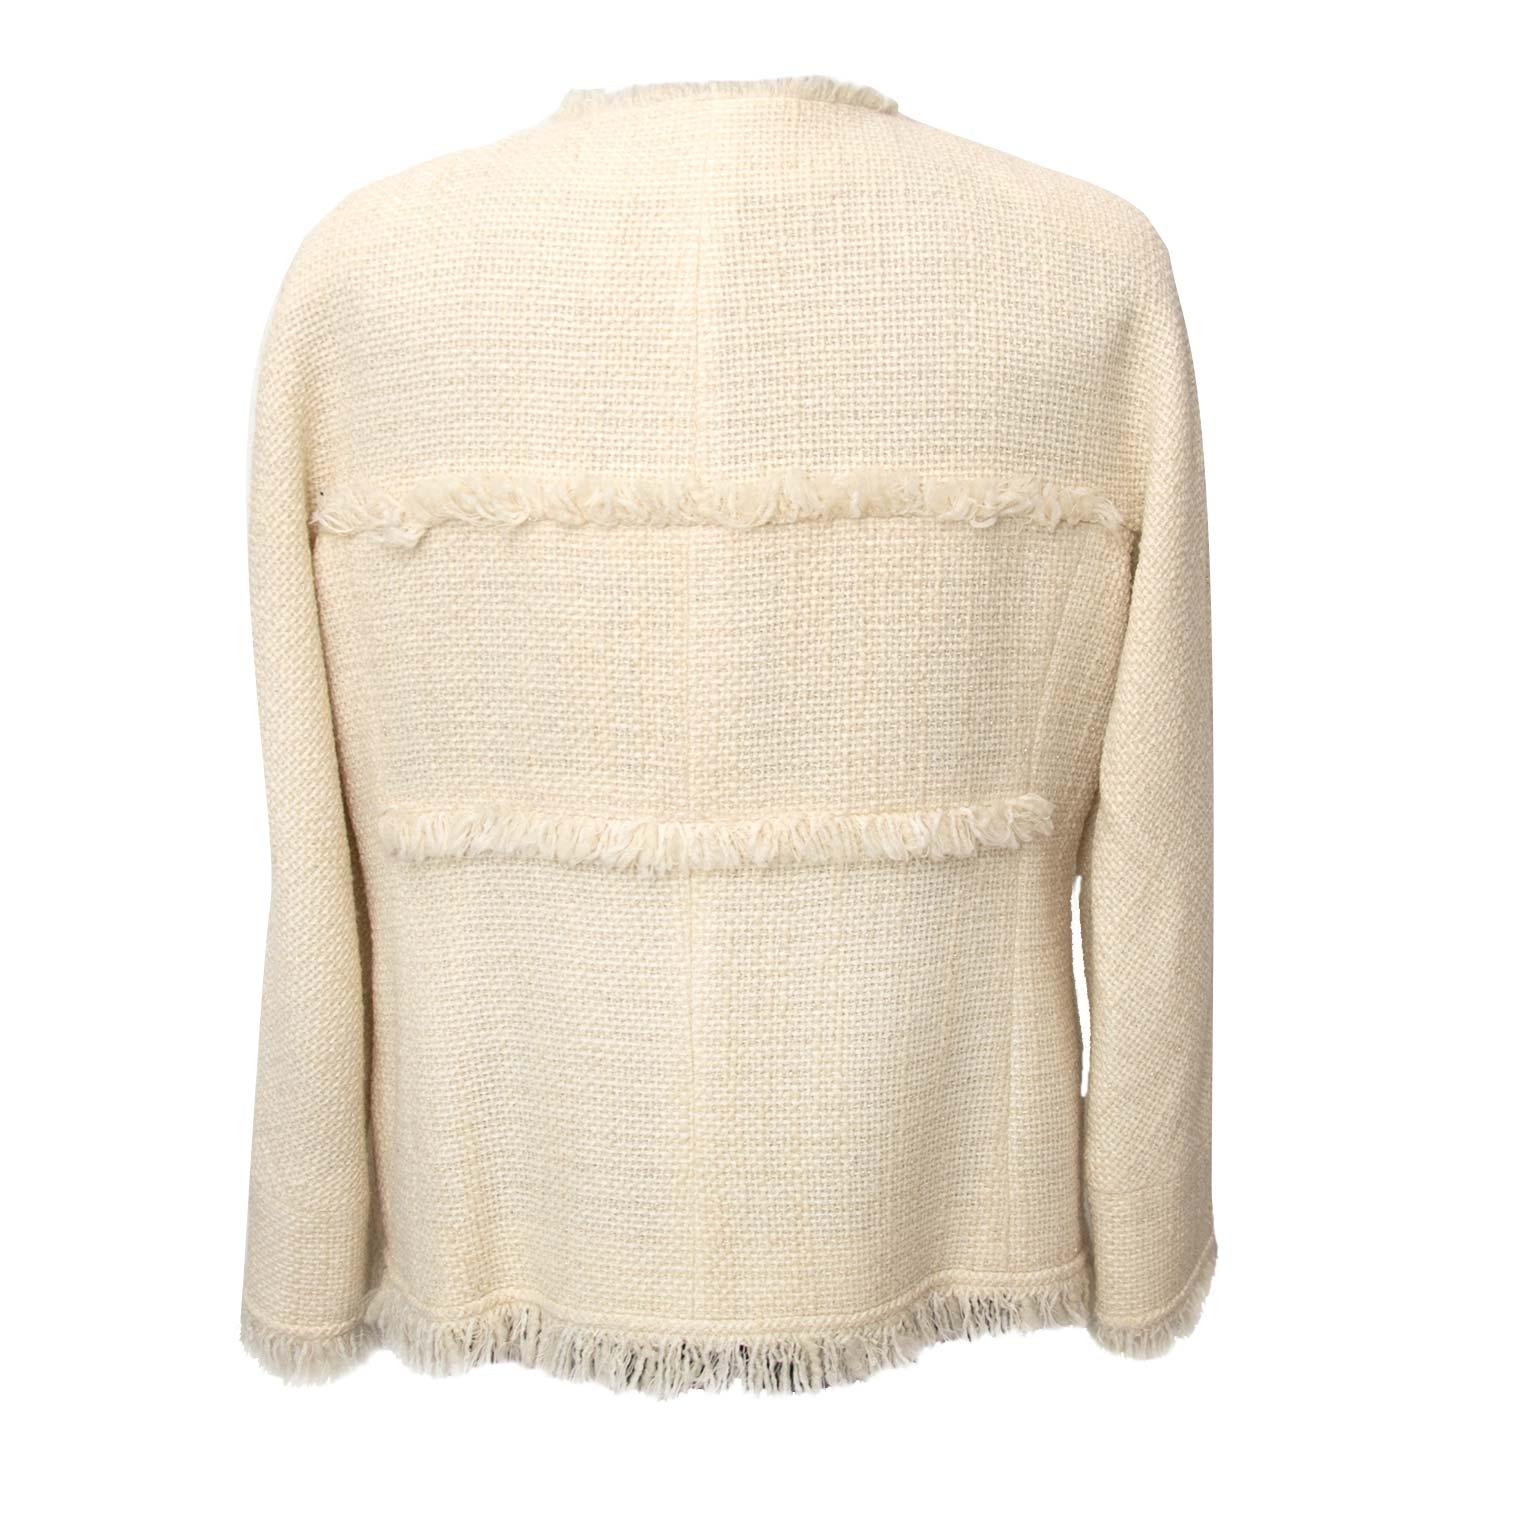 014a4da7704 ... Chanel Ecru Wool Blazer - Size 40 Buy authentic designer Chanel  secondhand clothes at Labellov at